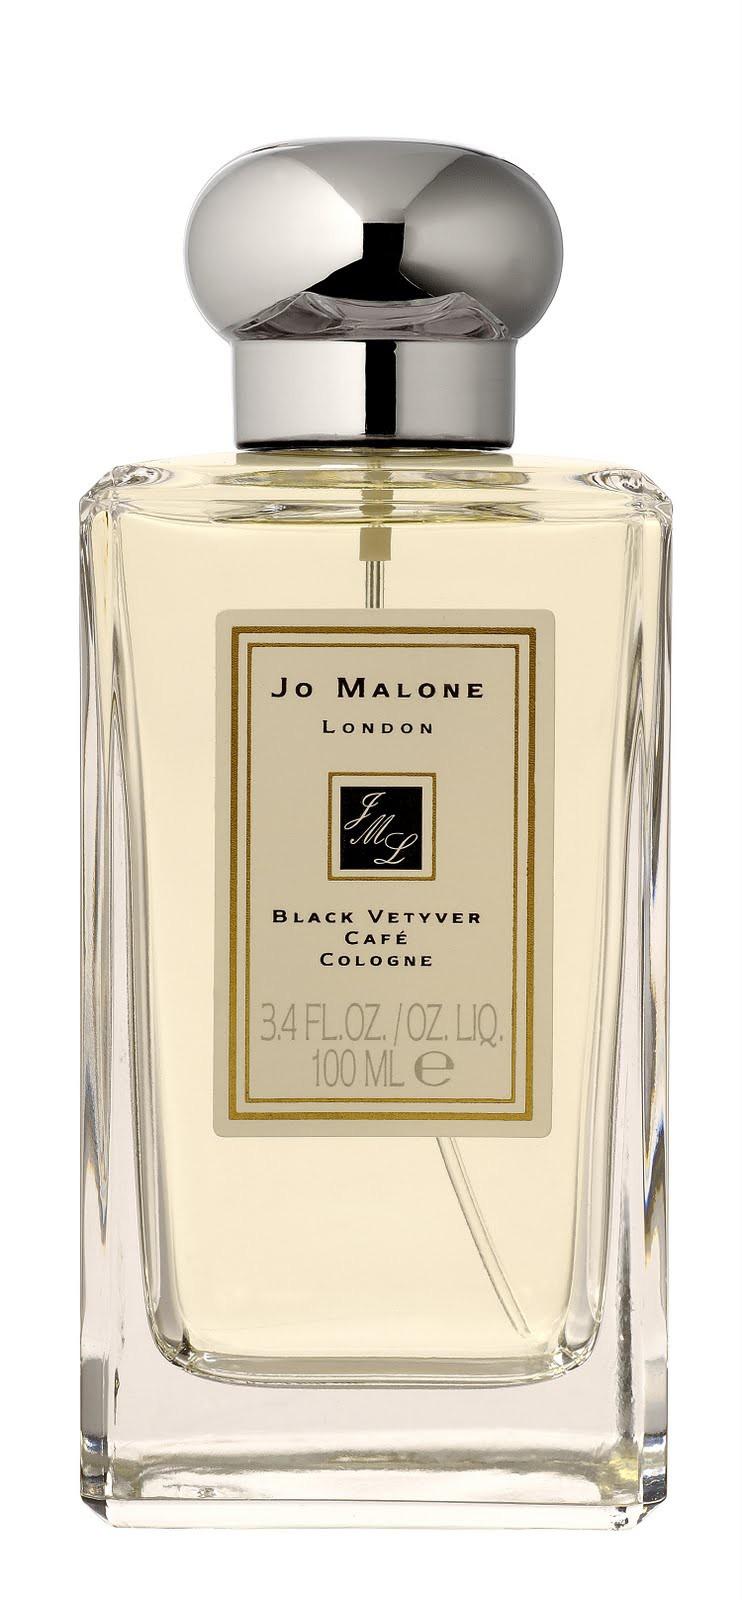 Jo Malone Black Vetyver Café аромат для мужчин и женщин